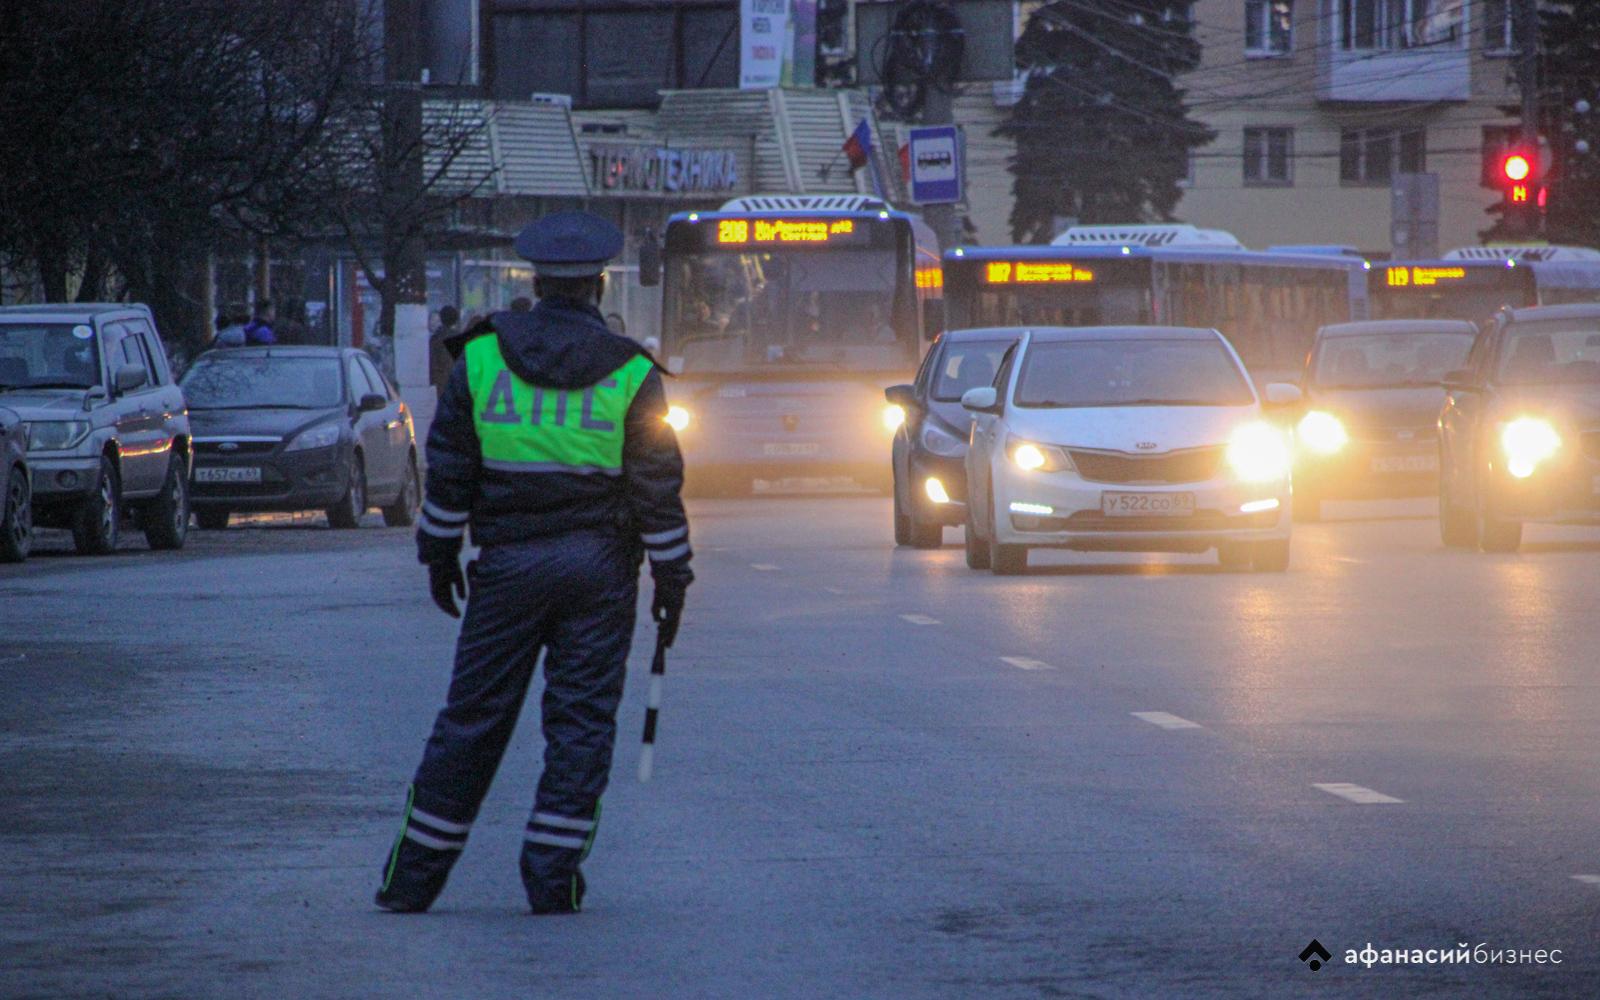 В Твери разыскивают очевидцев наезда на велосипедиста на улице Фадеева